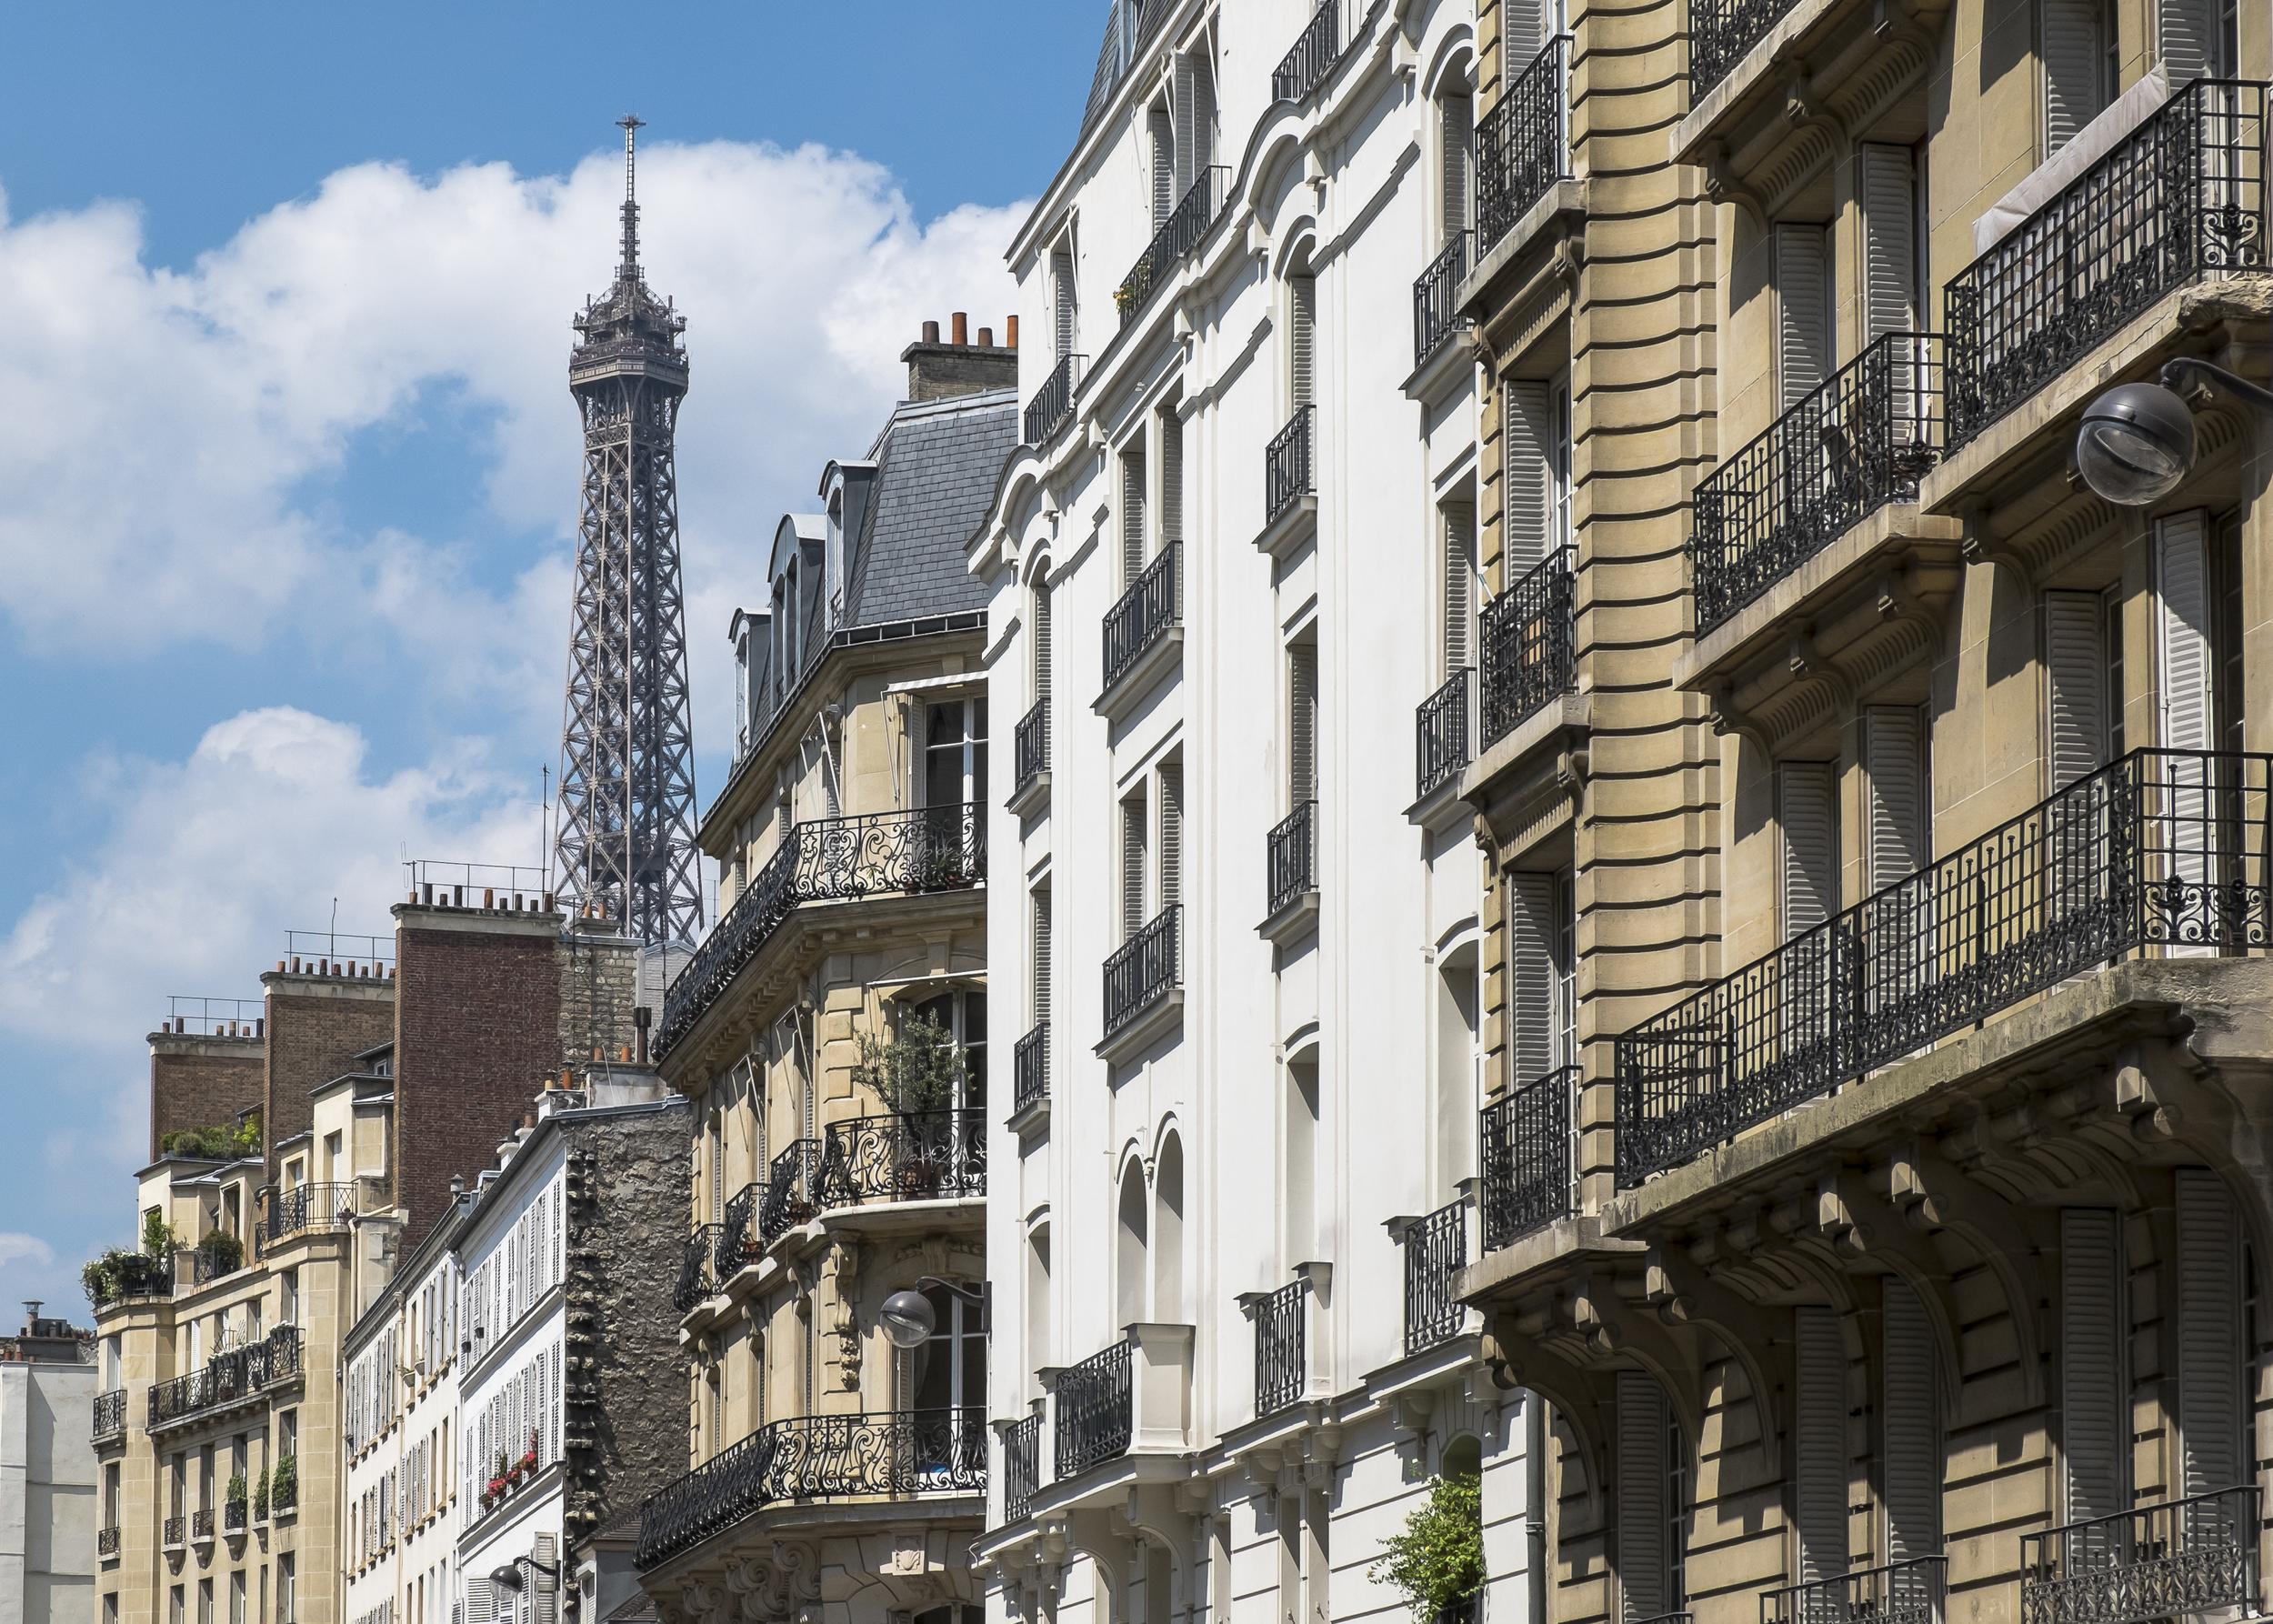 Paris-EiffelView2-20130707-DSCF3535.jpg